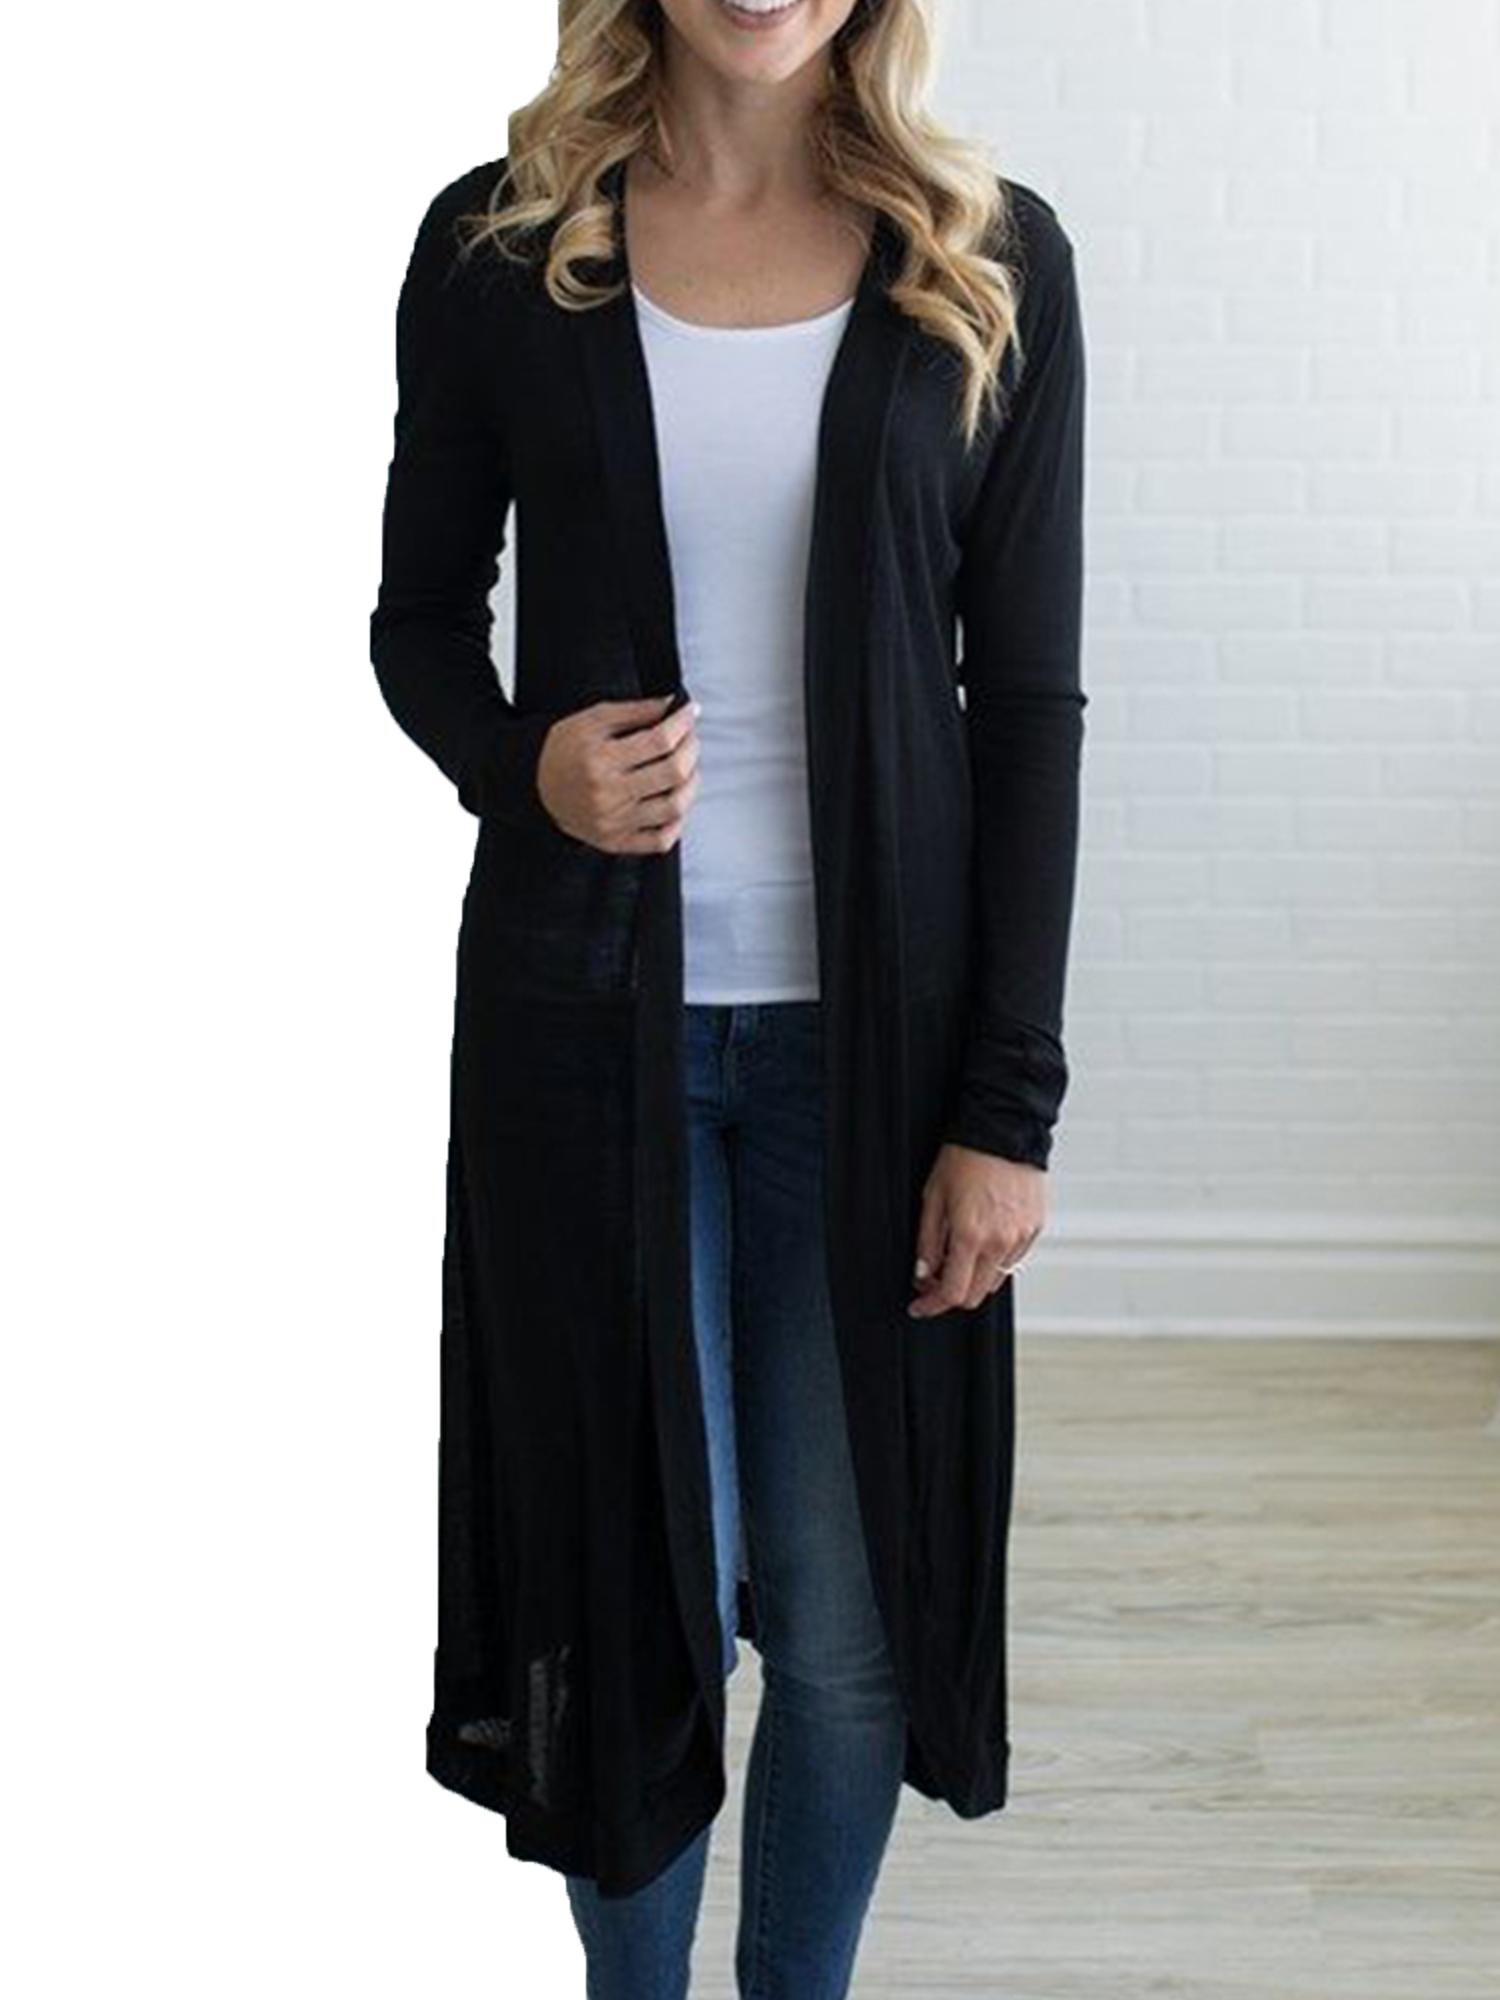 Women Long Sleeve Cardigan Trench Coat Open Front Jacket Overcoat Casual Outwear